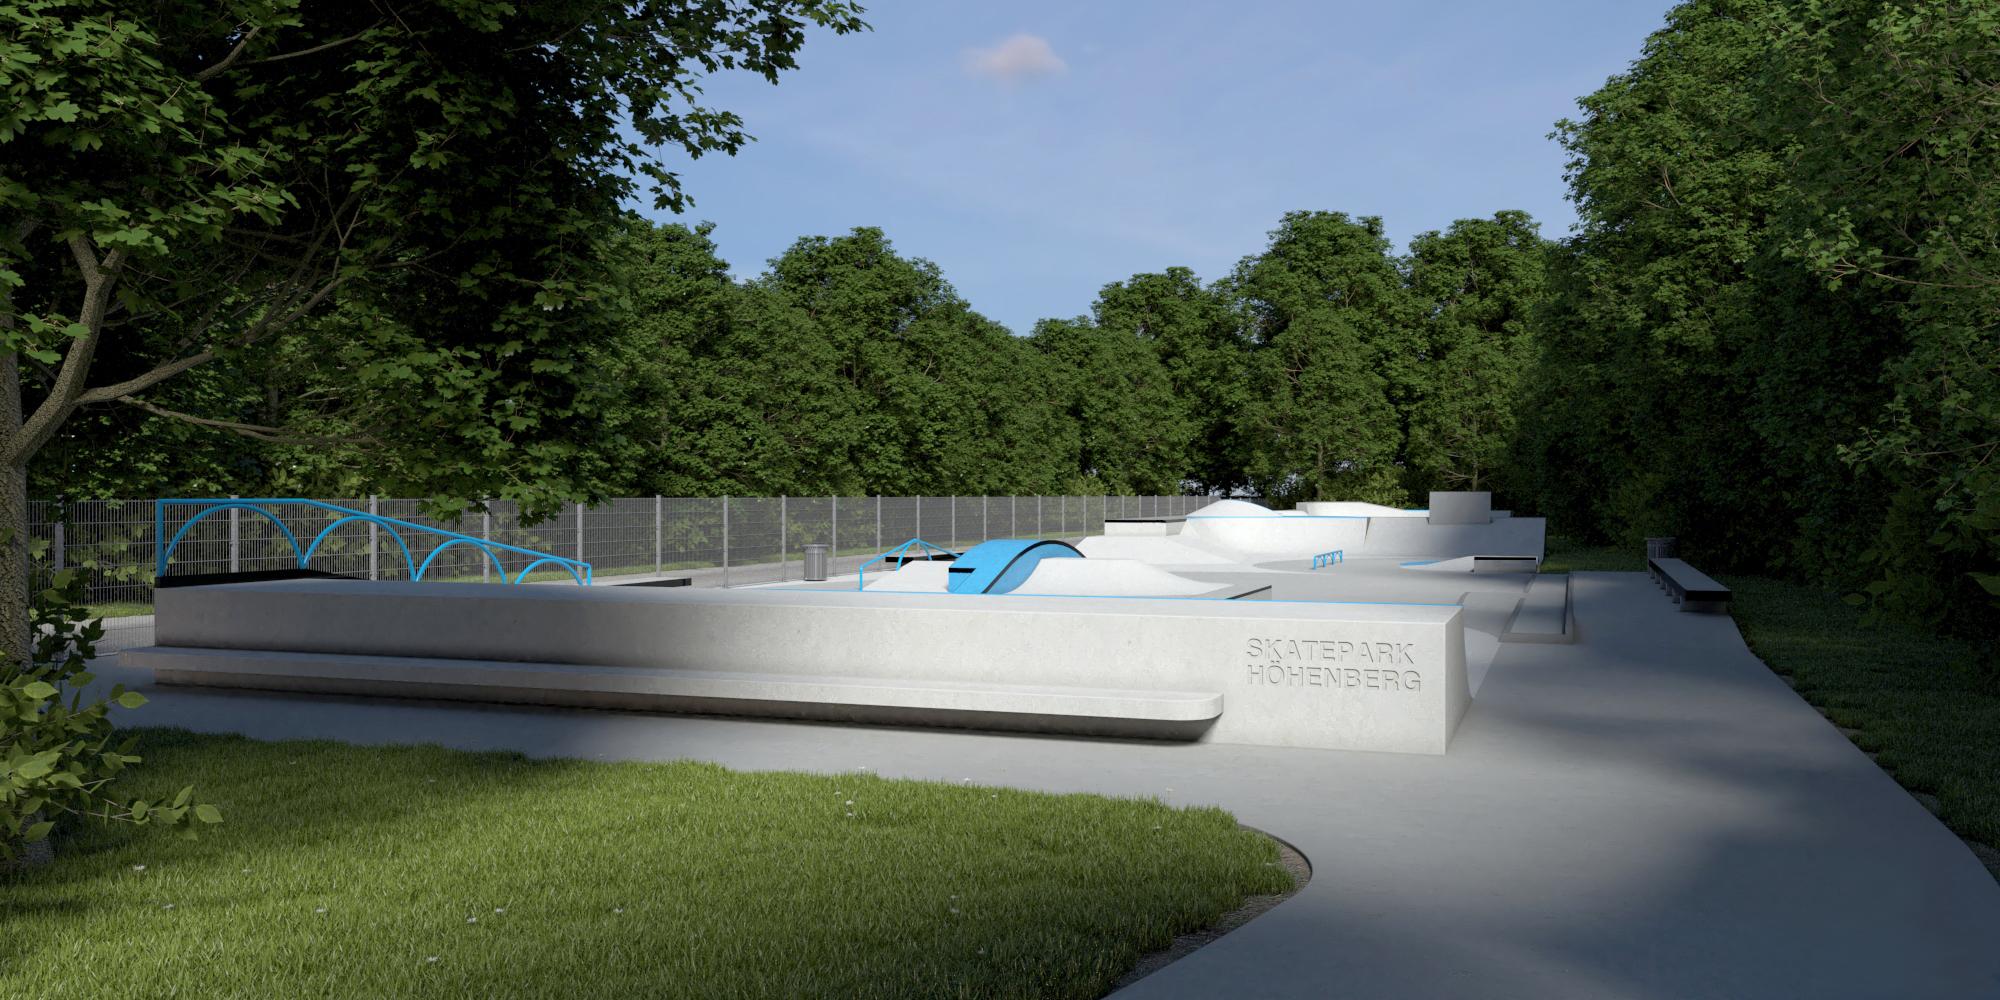 hhenberg_rendering_skatepark_lndskt_2000x1000